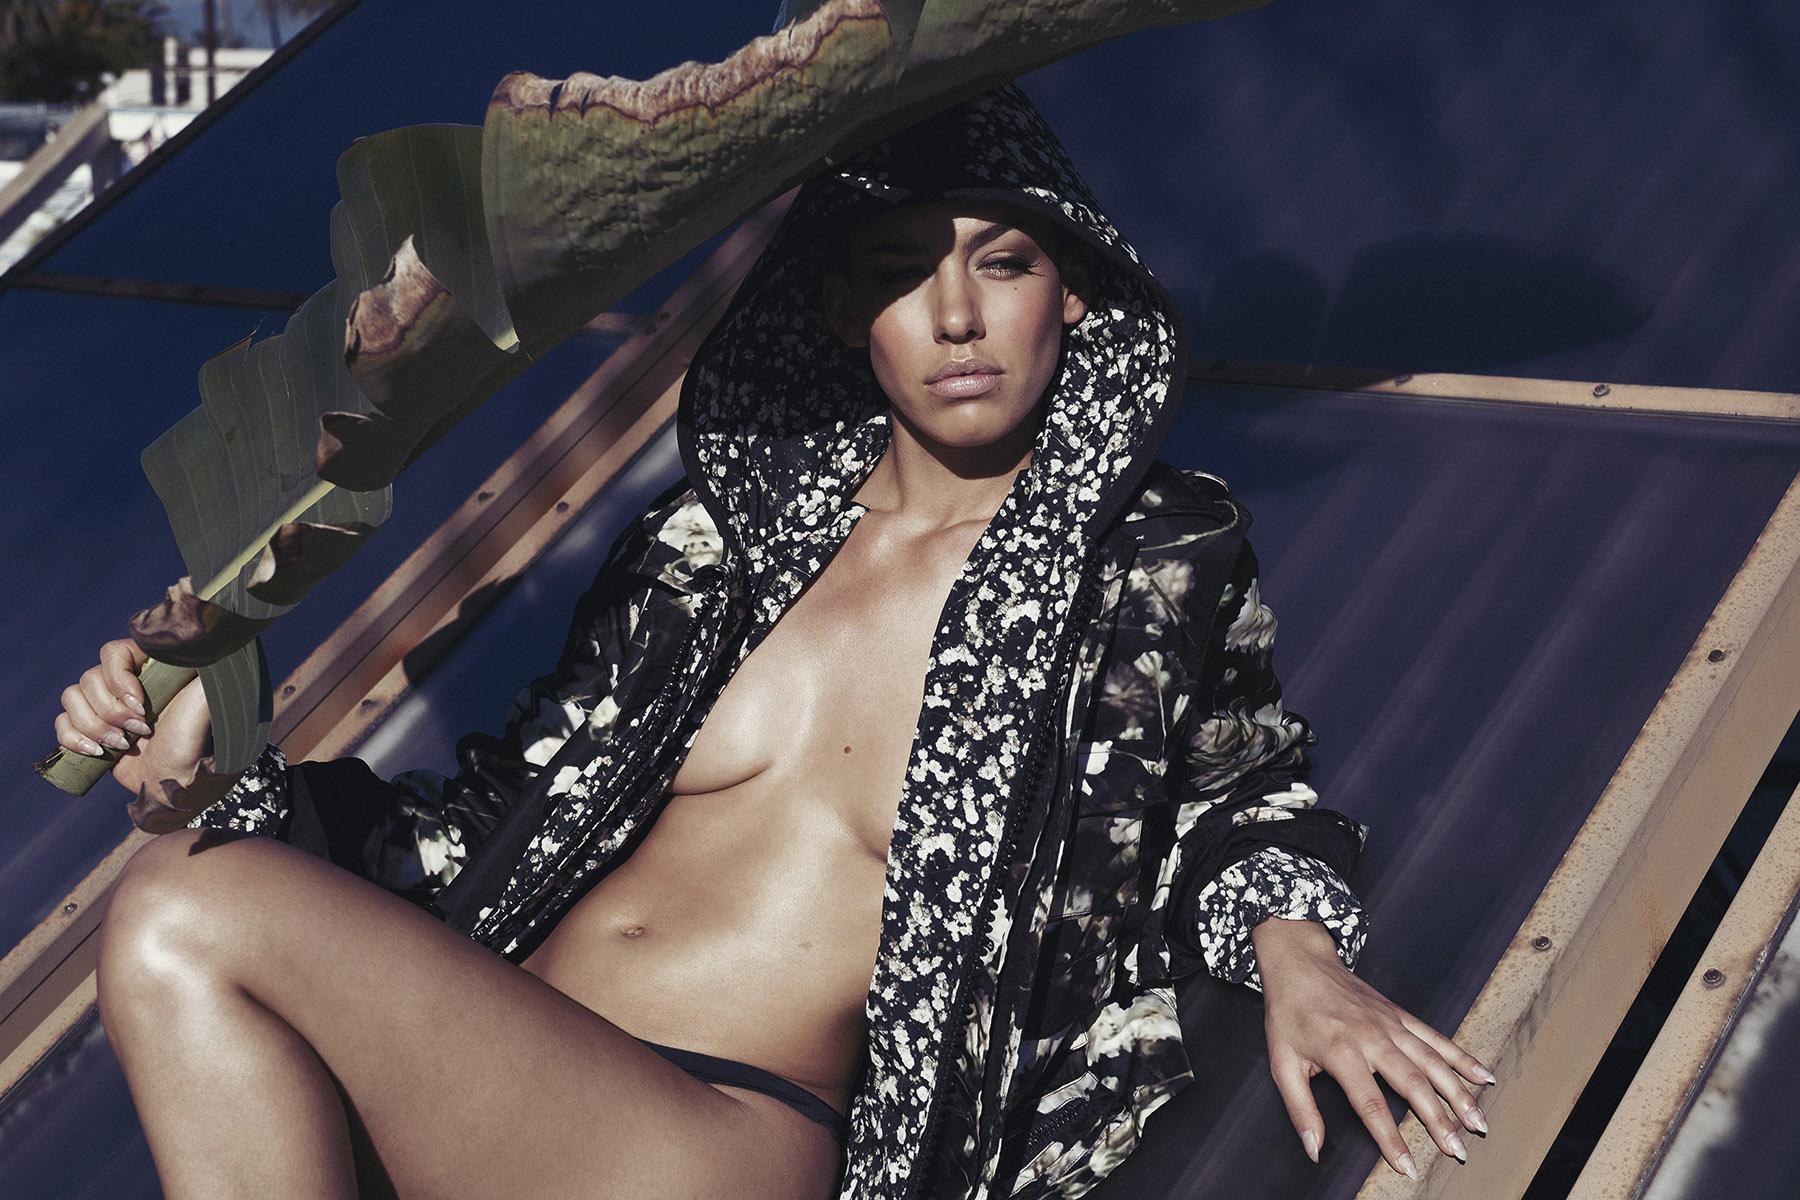 Alina Süggeler for GQ Germany